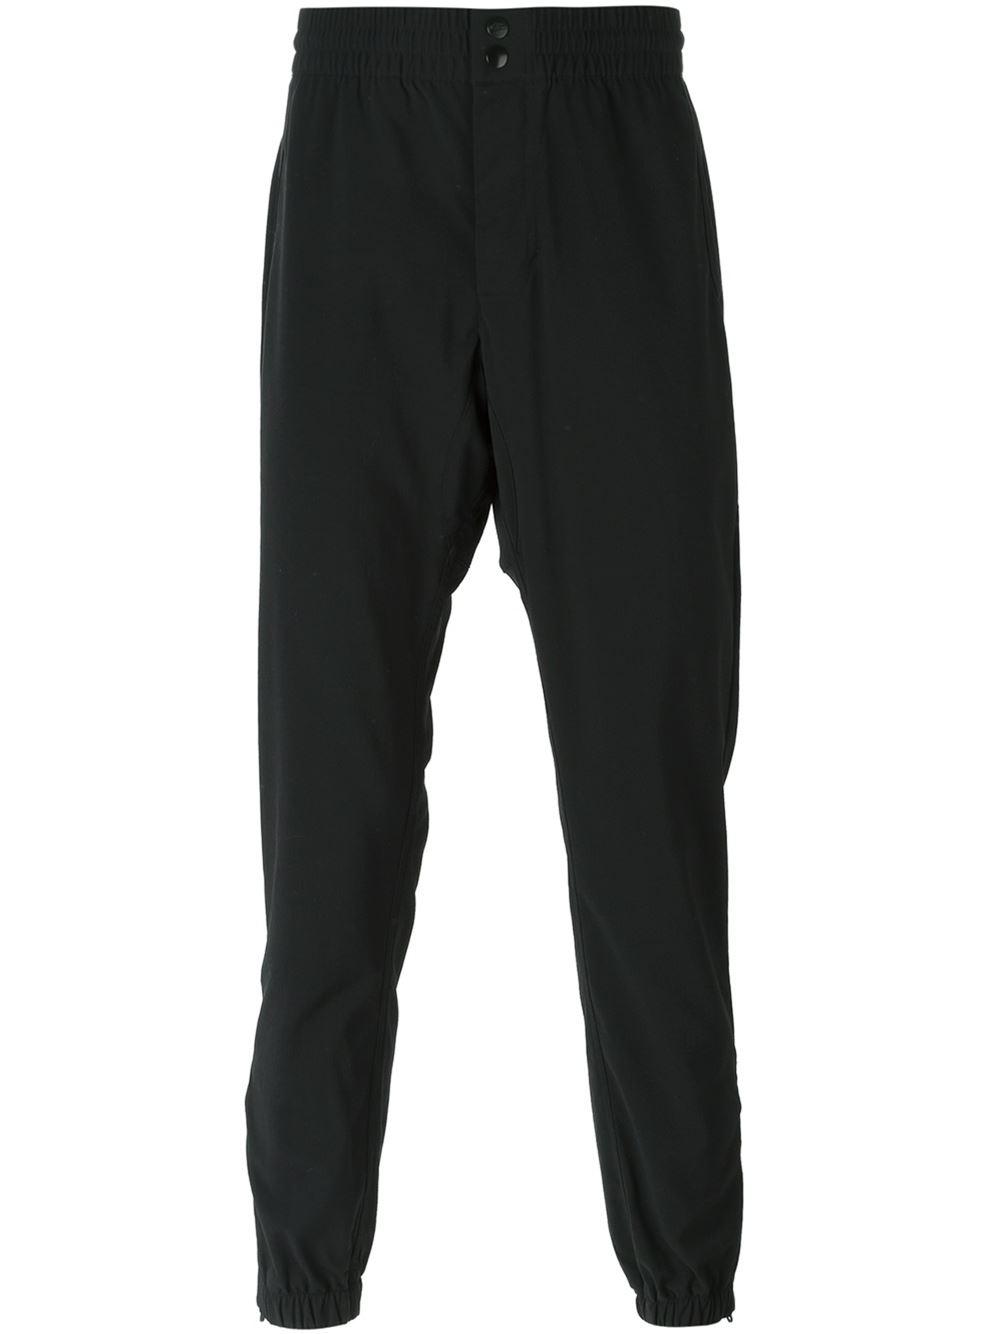 Nike V442 Track Pants In Black For Men Lyst